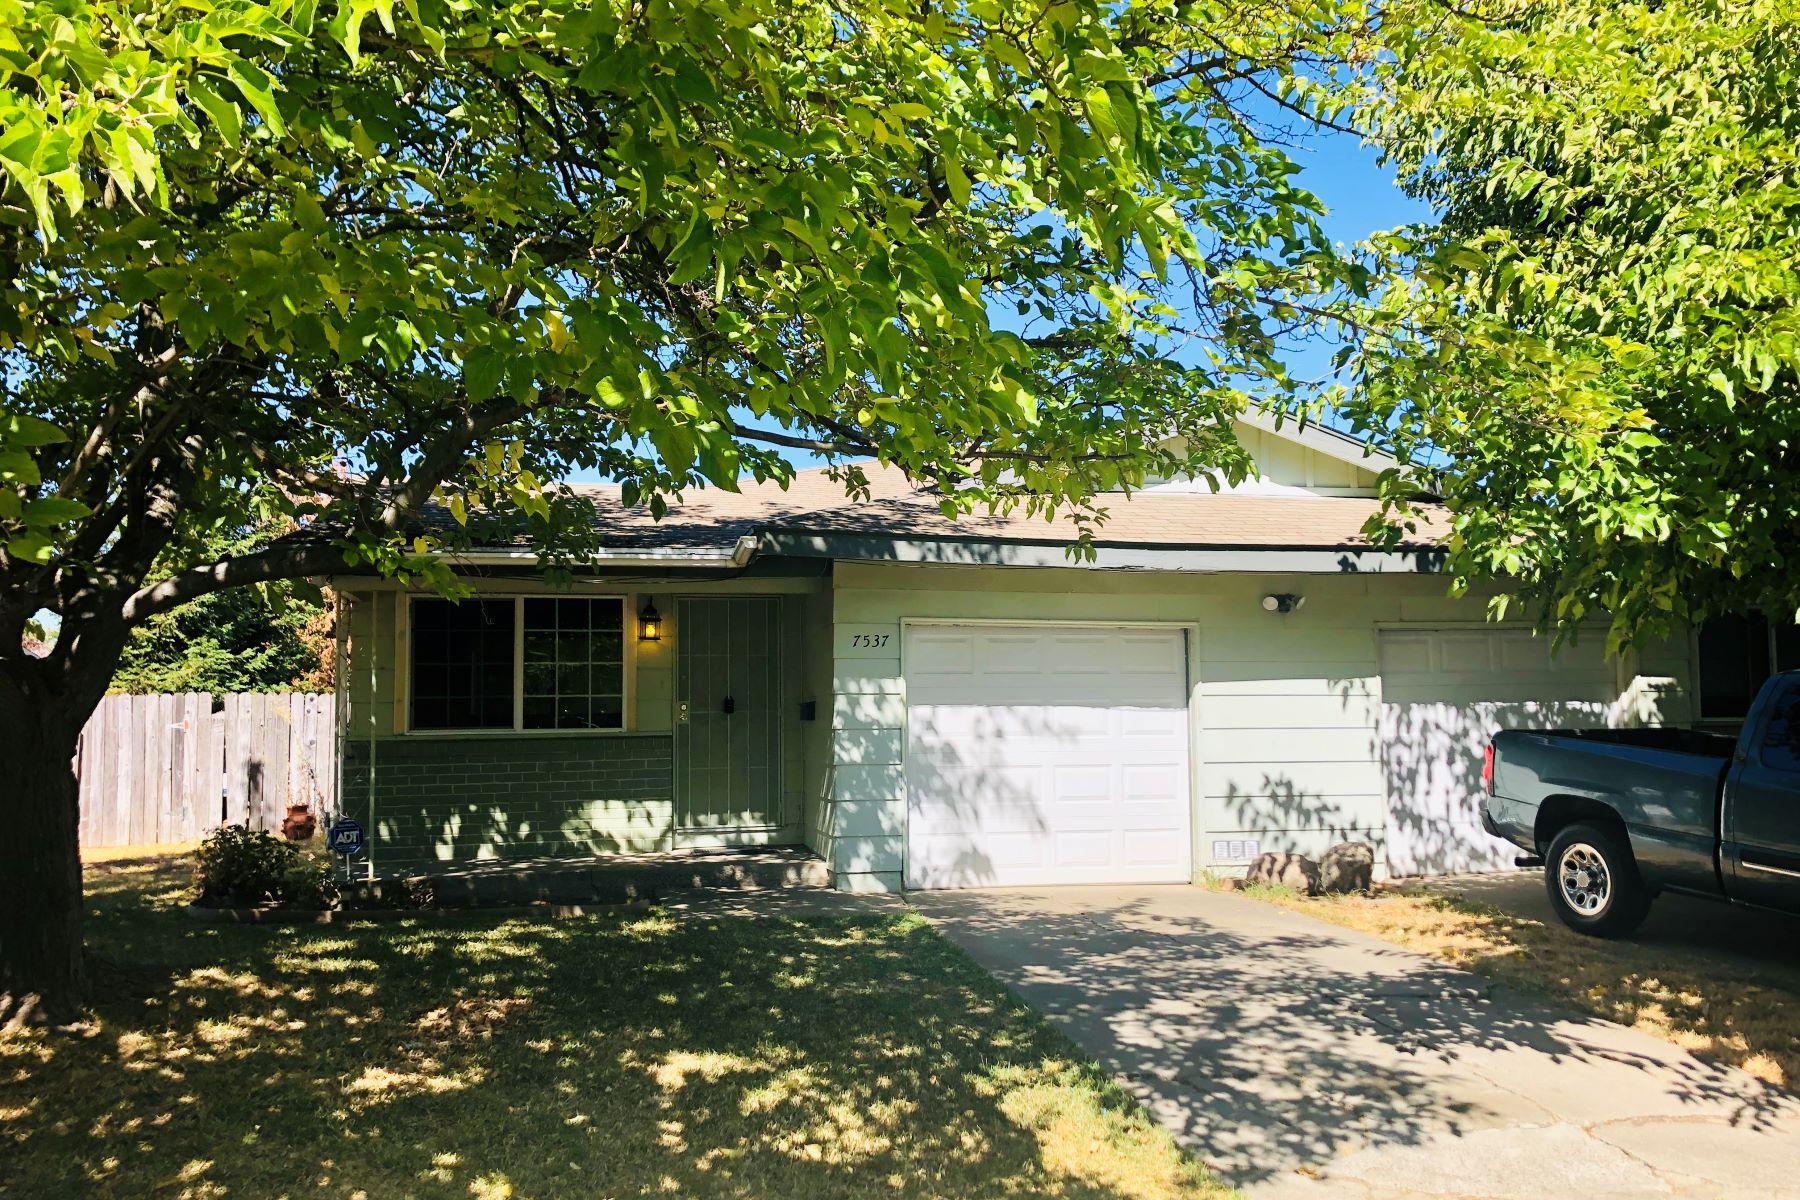 Duplex Homes for Sale at 7537-7539 Bowen Circle, Sacramento, CA 95822 7537-7539 Bowen Circle Sacramento, California 95822 United States